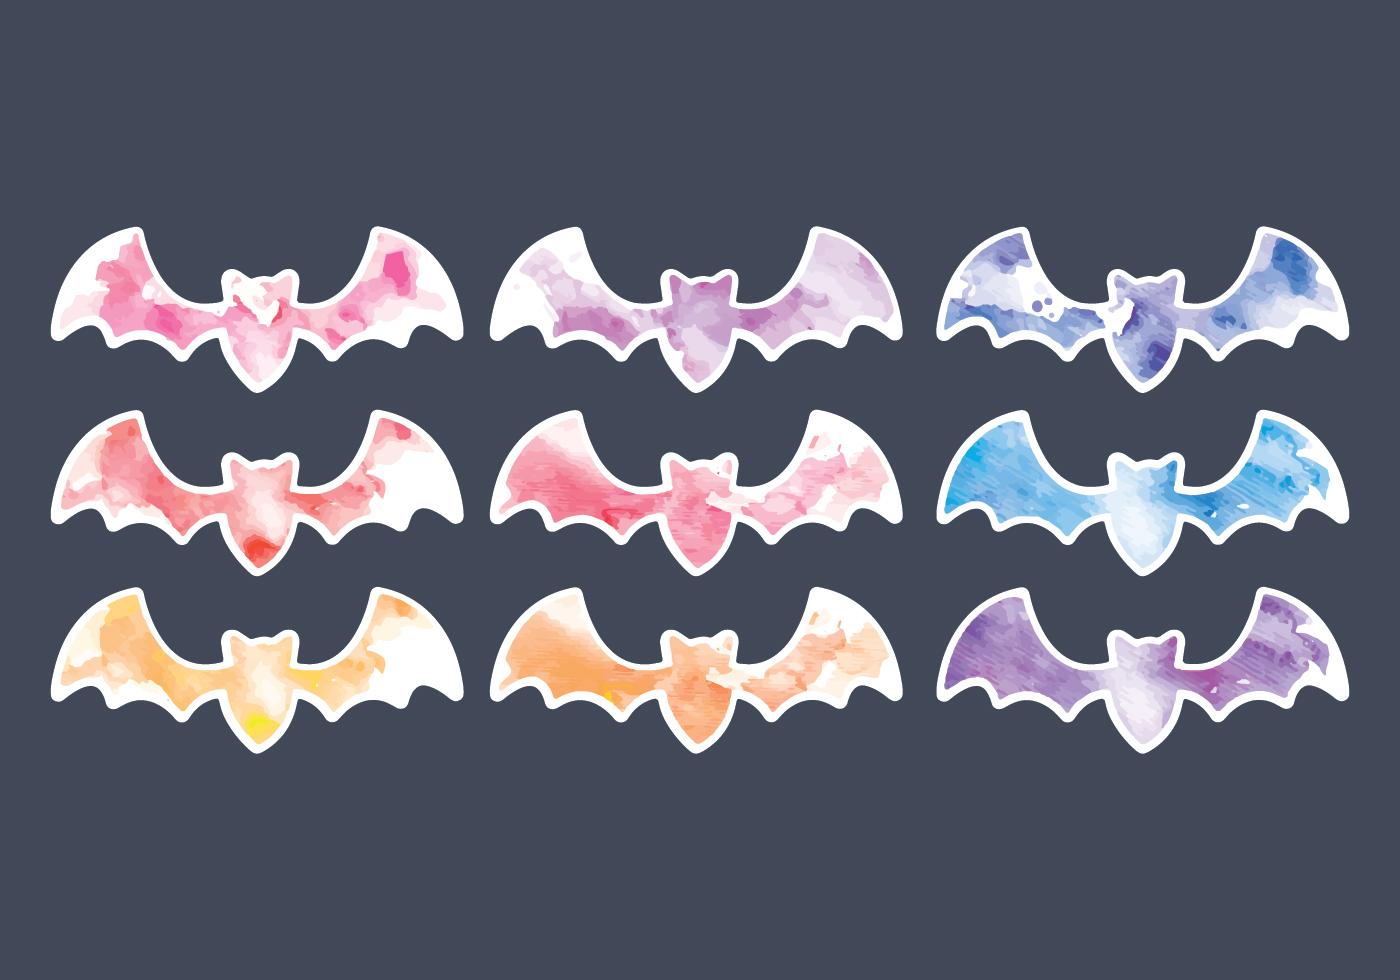 q版蝙蝠 免費下載 | 天天瘋後製